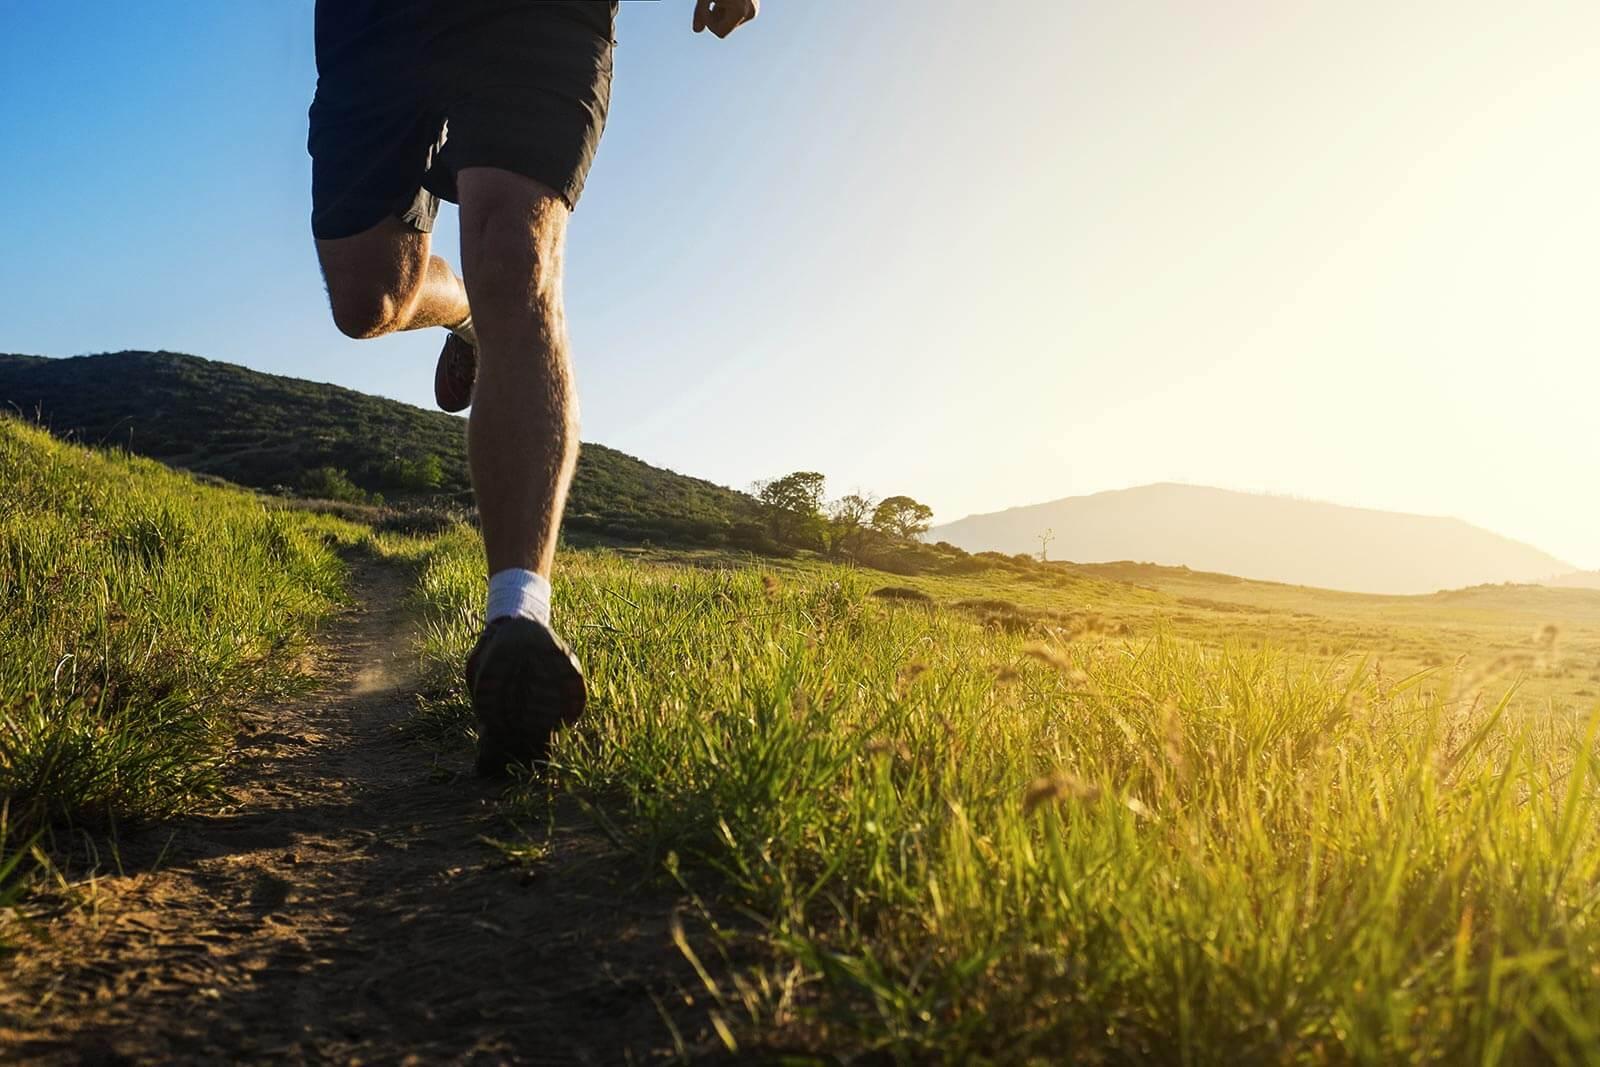 Benefici sport all'aria aperta | Relais in Maremma